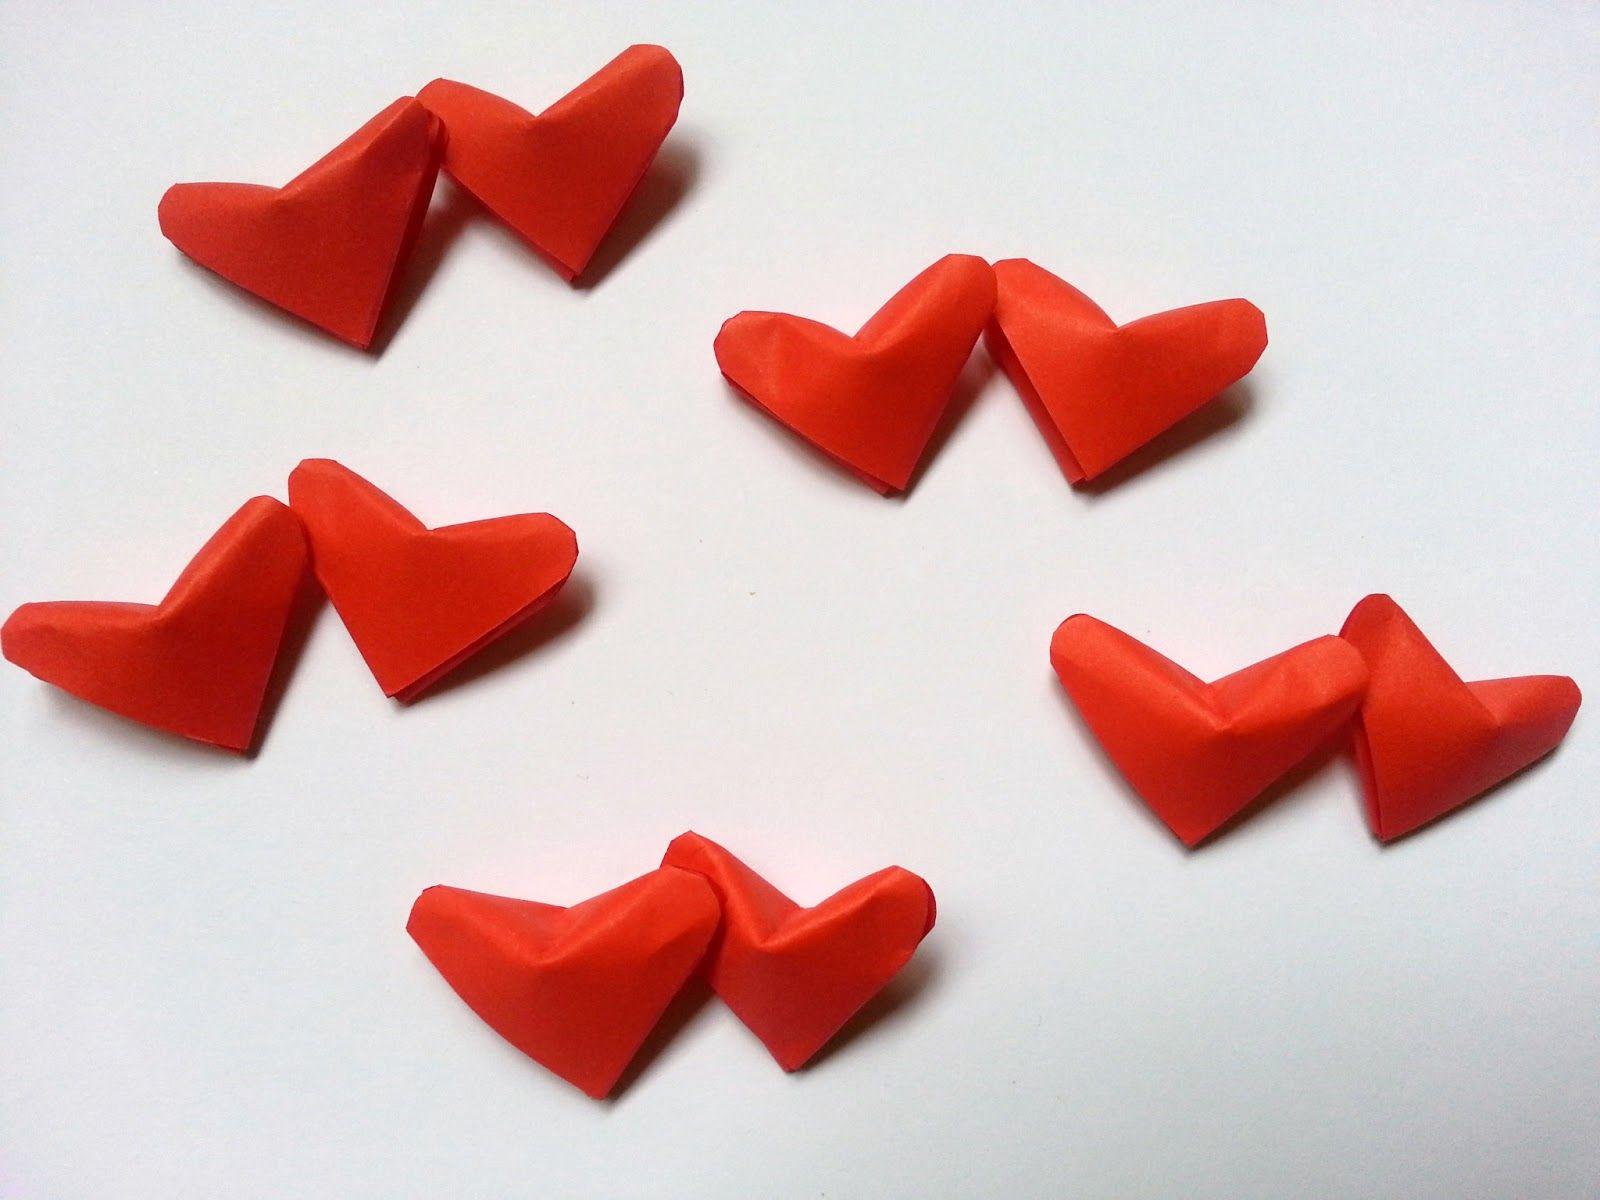 3D Origami Hearts | Hearts | Pinterest | 3D Origami ... - photo#10